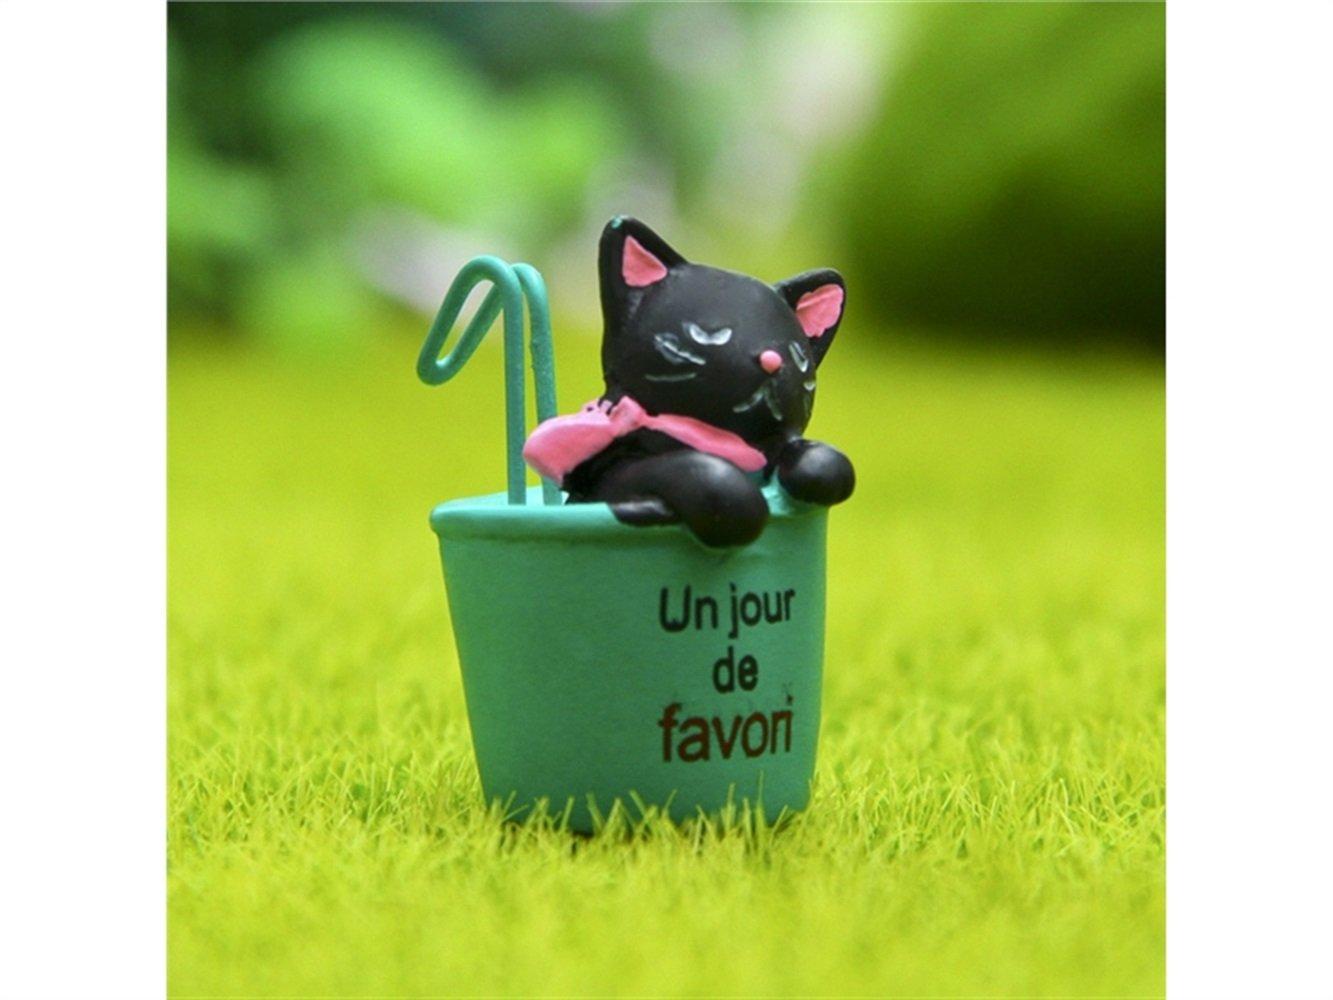 Kxrzu Groß Miniatur Micro Landschaft Ornamente Hängen Tasse Katze DIY Garten Dekor Home Beste Pflanze Geschenk (Grüne Tasse)